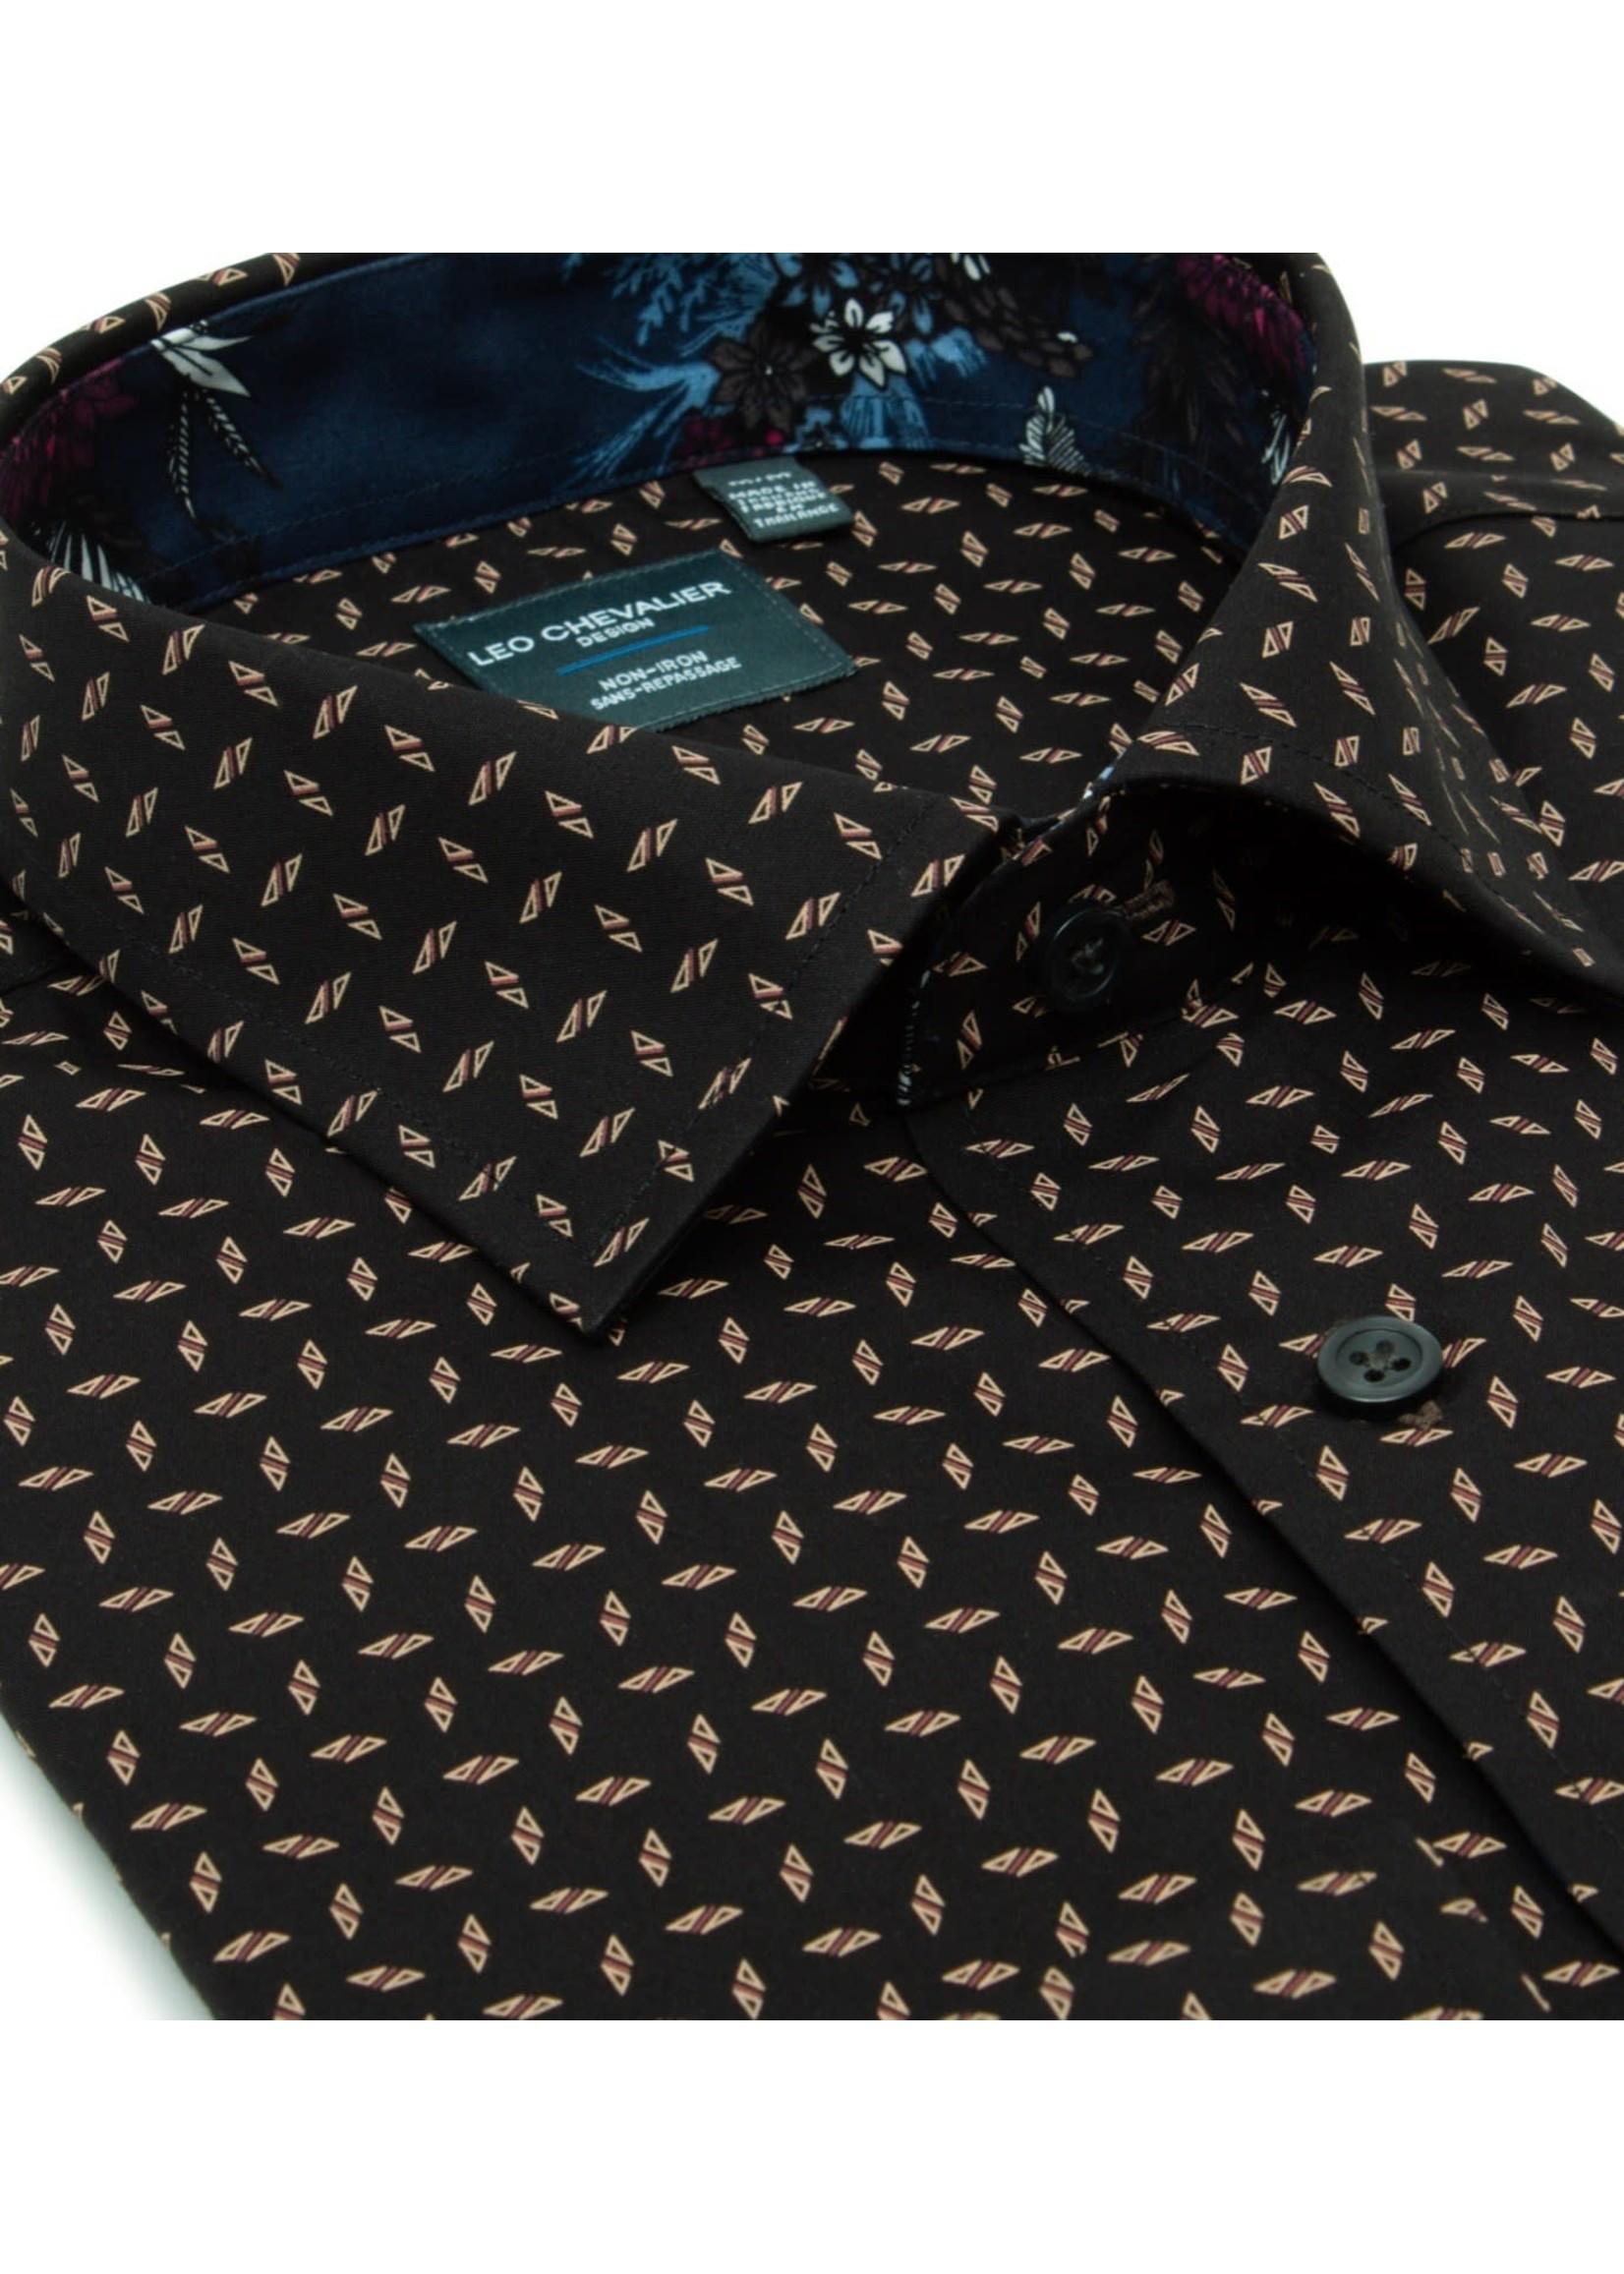 Leo Chevalier Leo Chevalier Men's 100% Cotton Non-Iron Spread Collar Sport Shirt